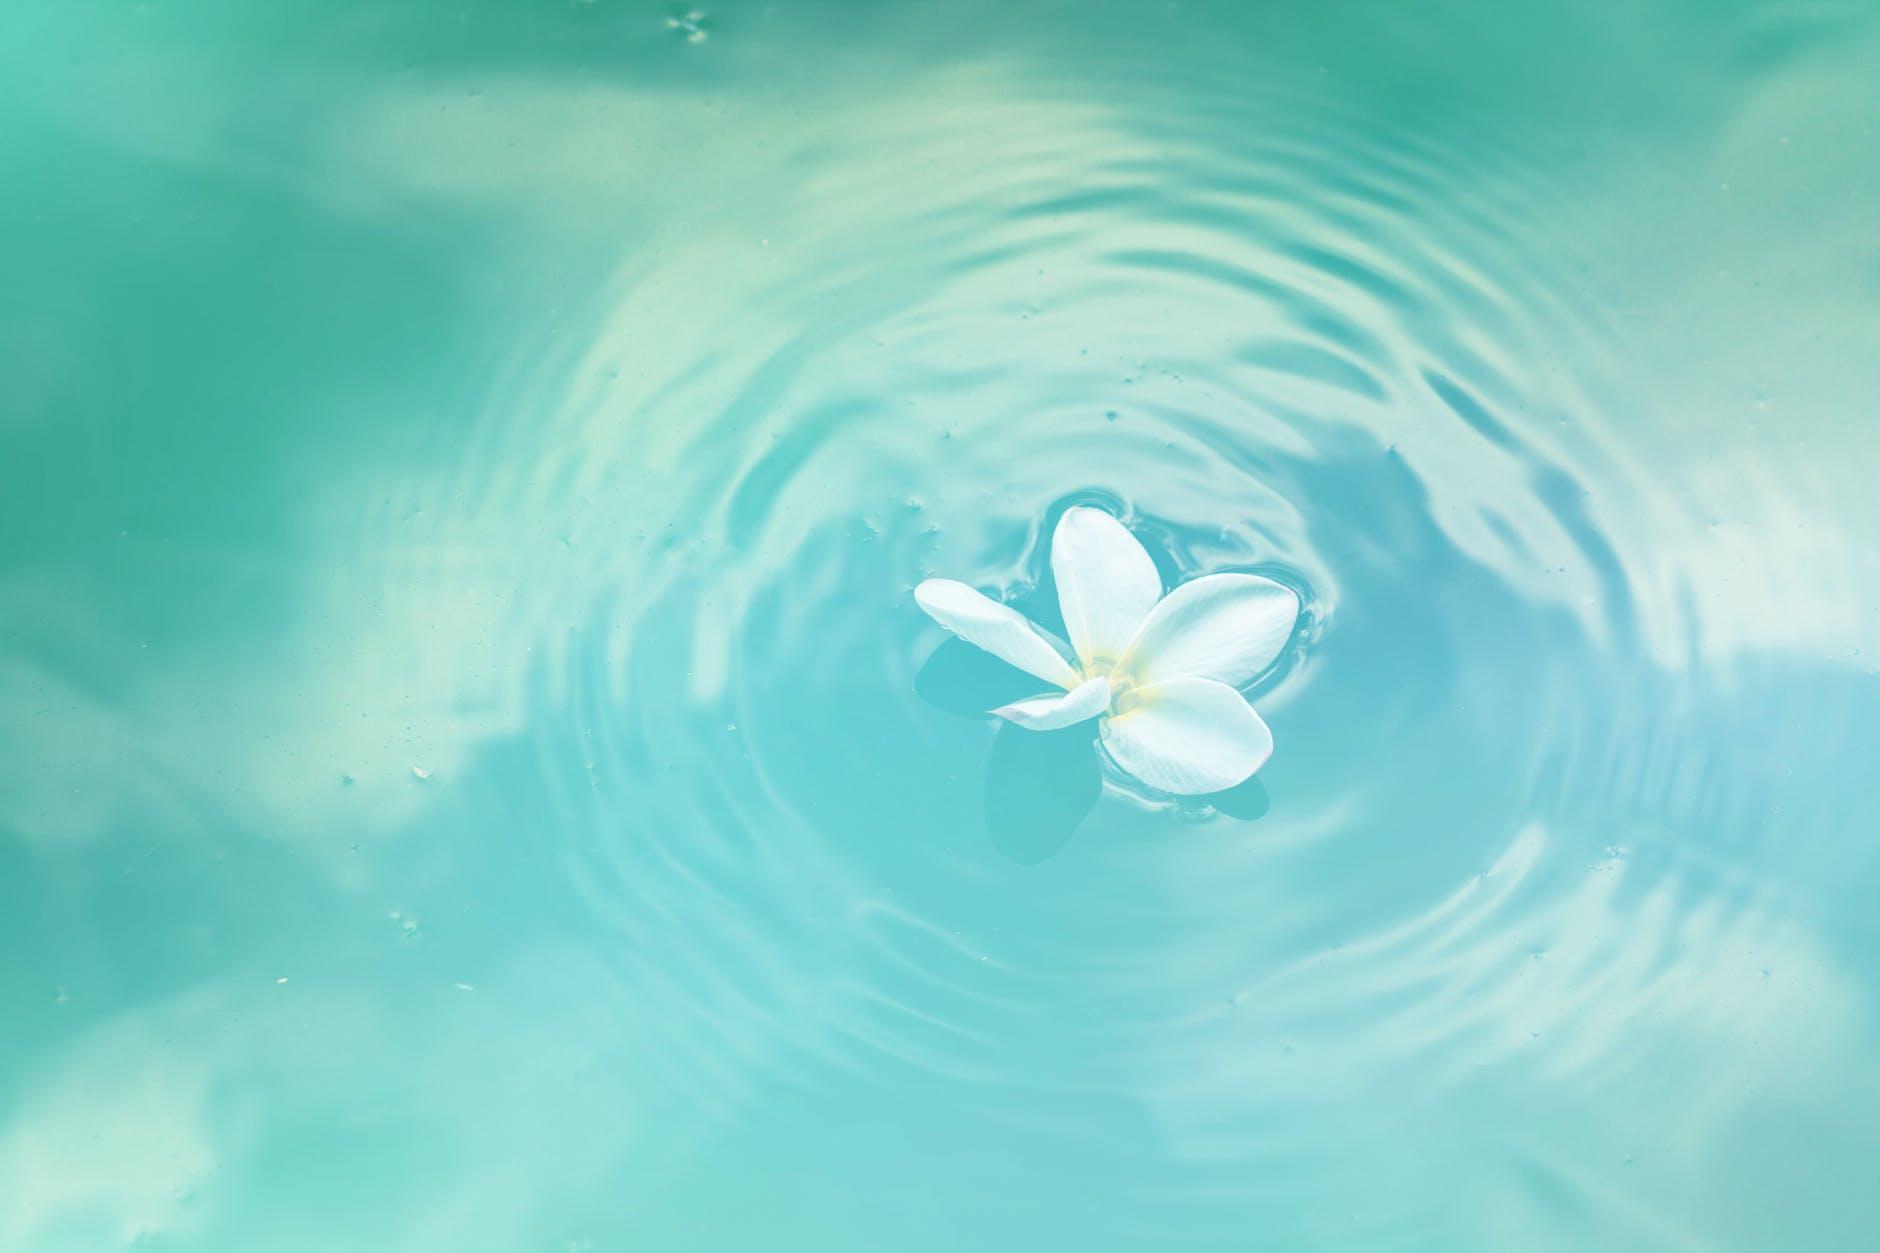 kukka_vedessa.jpeg